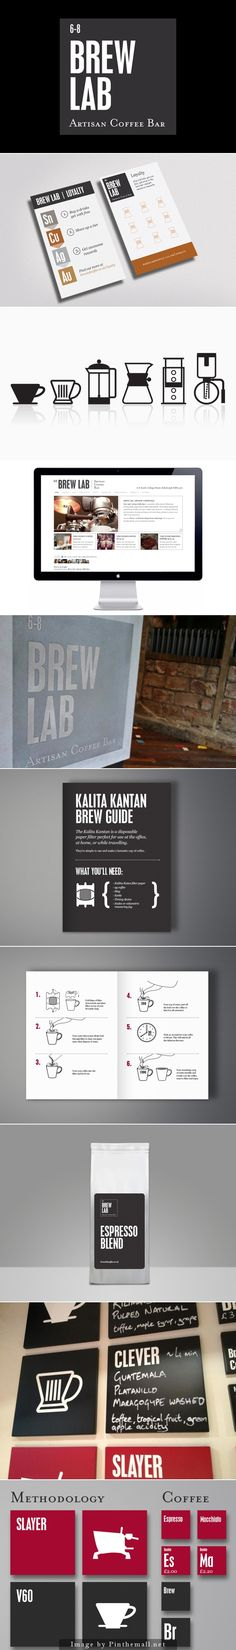 brew lab, artisan coffee bar